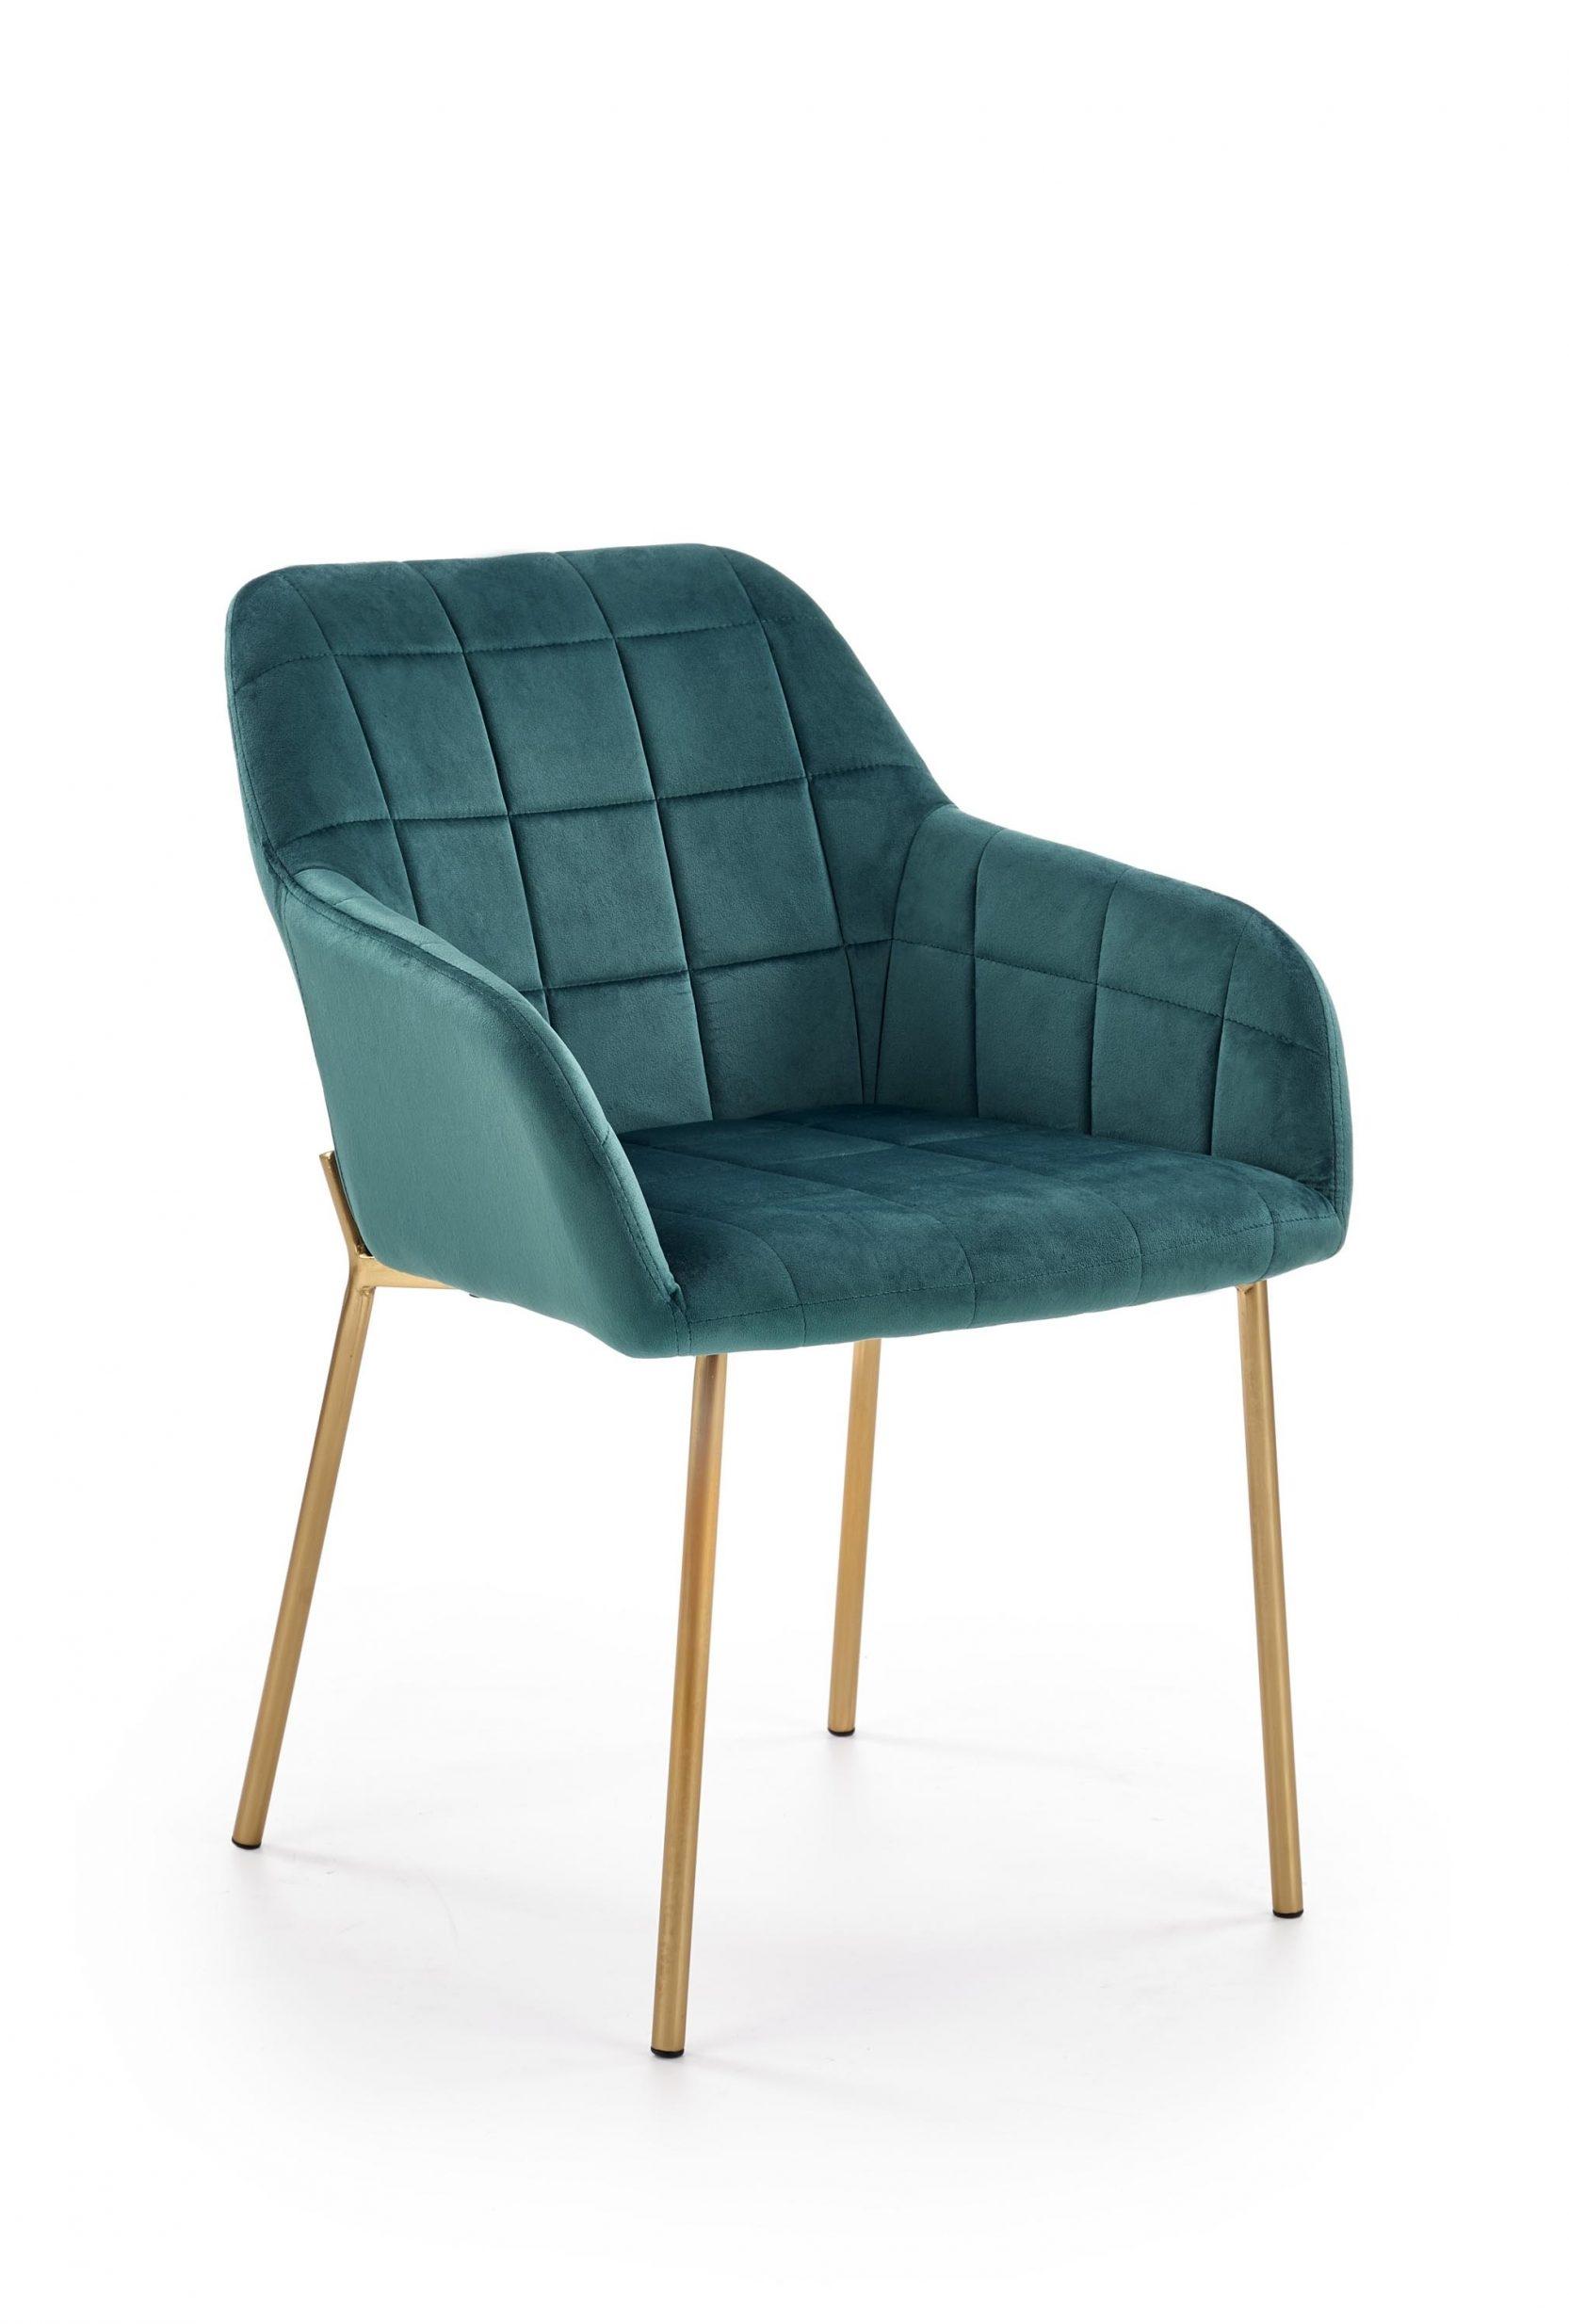 Scaun tapitat cu stofa, cu picioare metalice K306 Verde inchis / Auriu, l58xA57xH80 cm